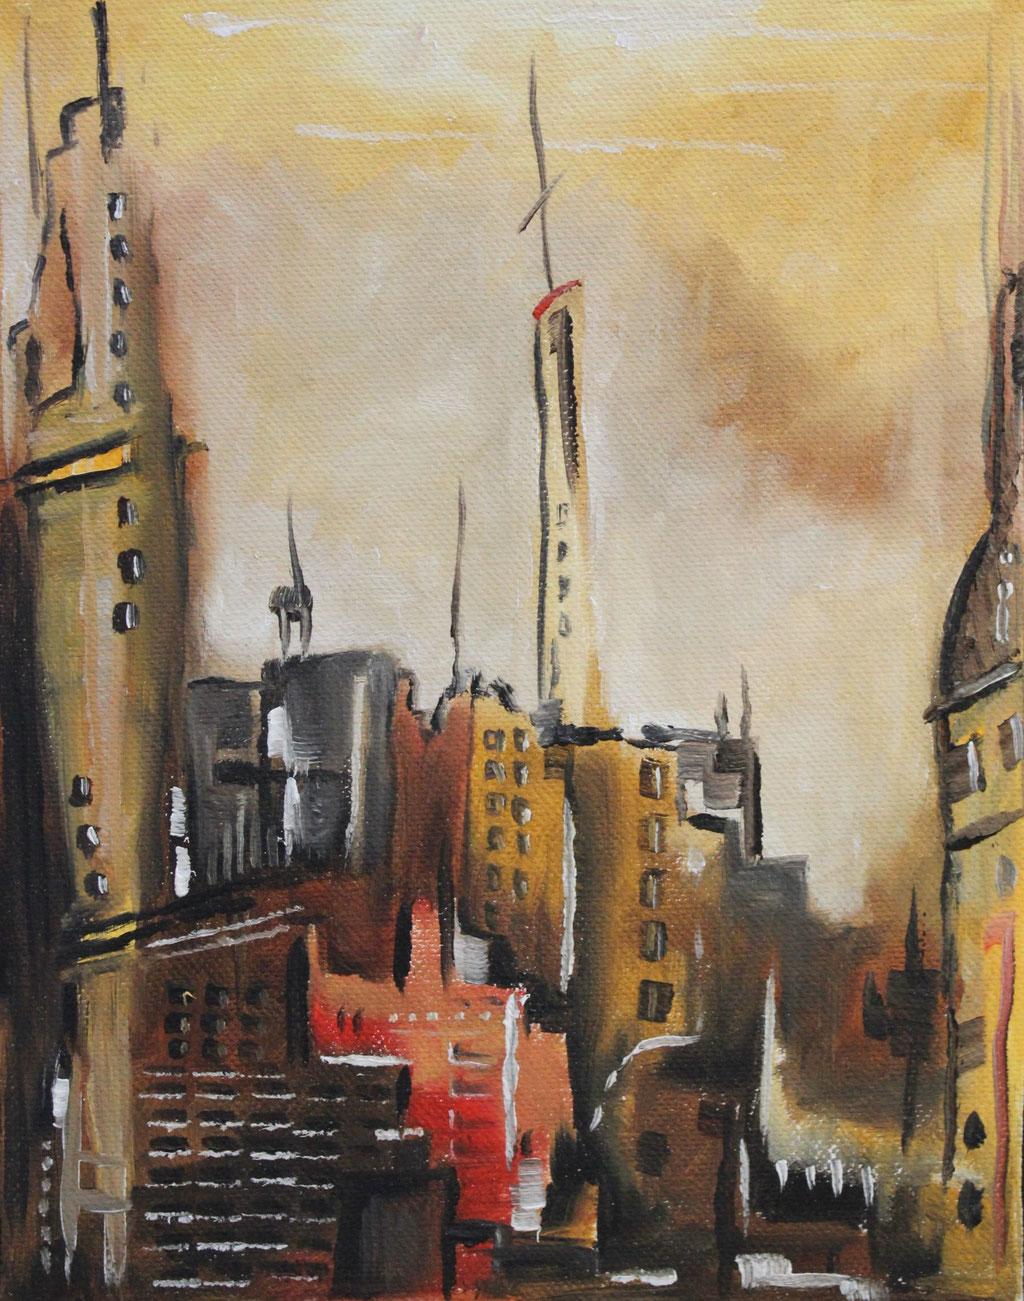 """Urban Landscape"" (Auszug) | 2018 | Öl auf Leinwand"